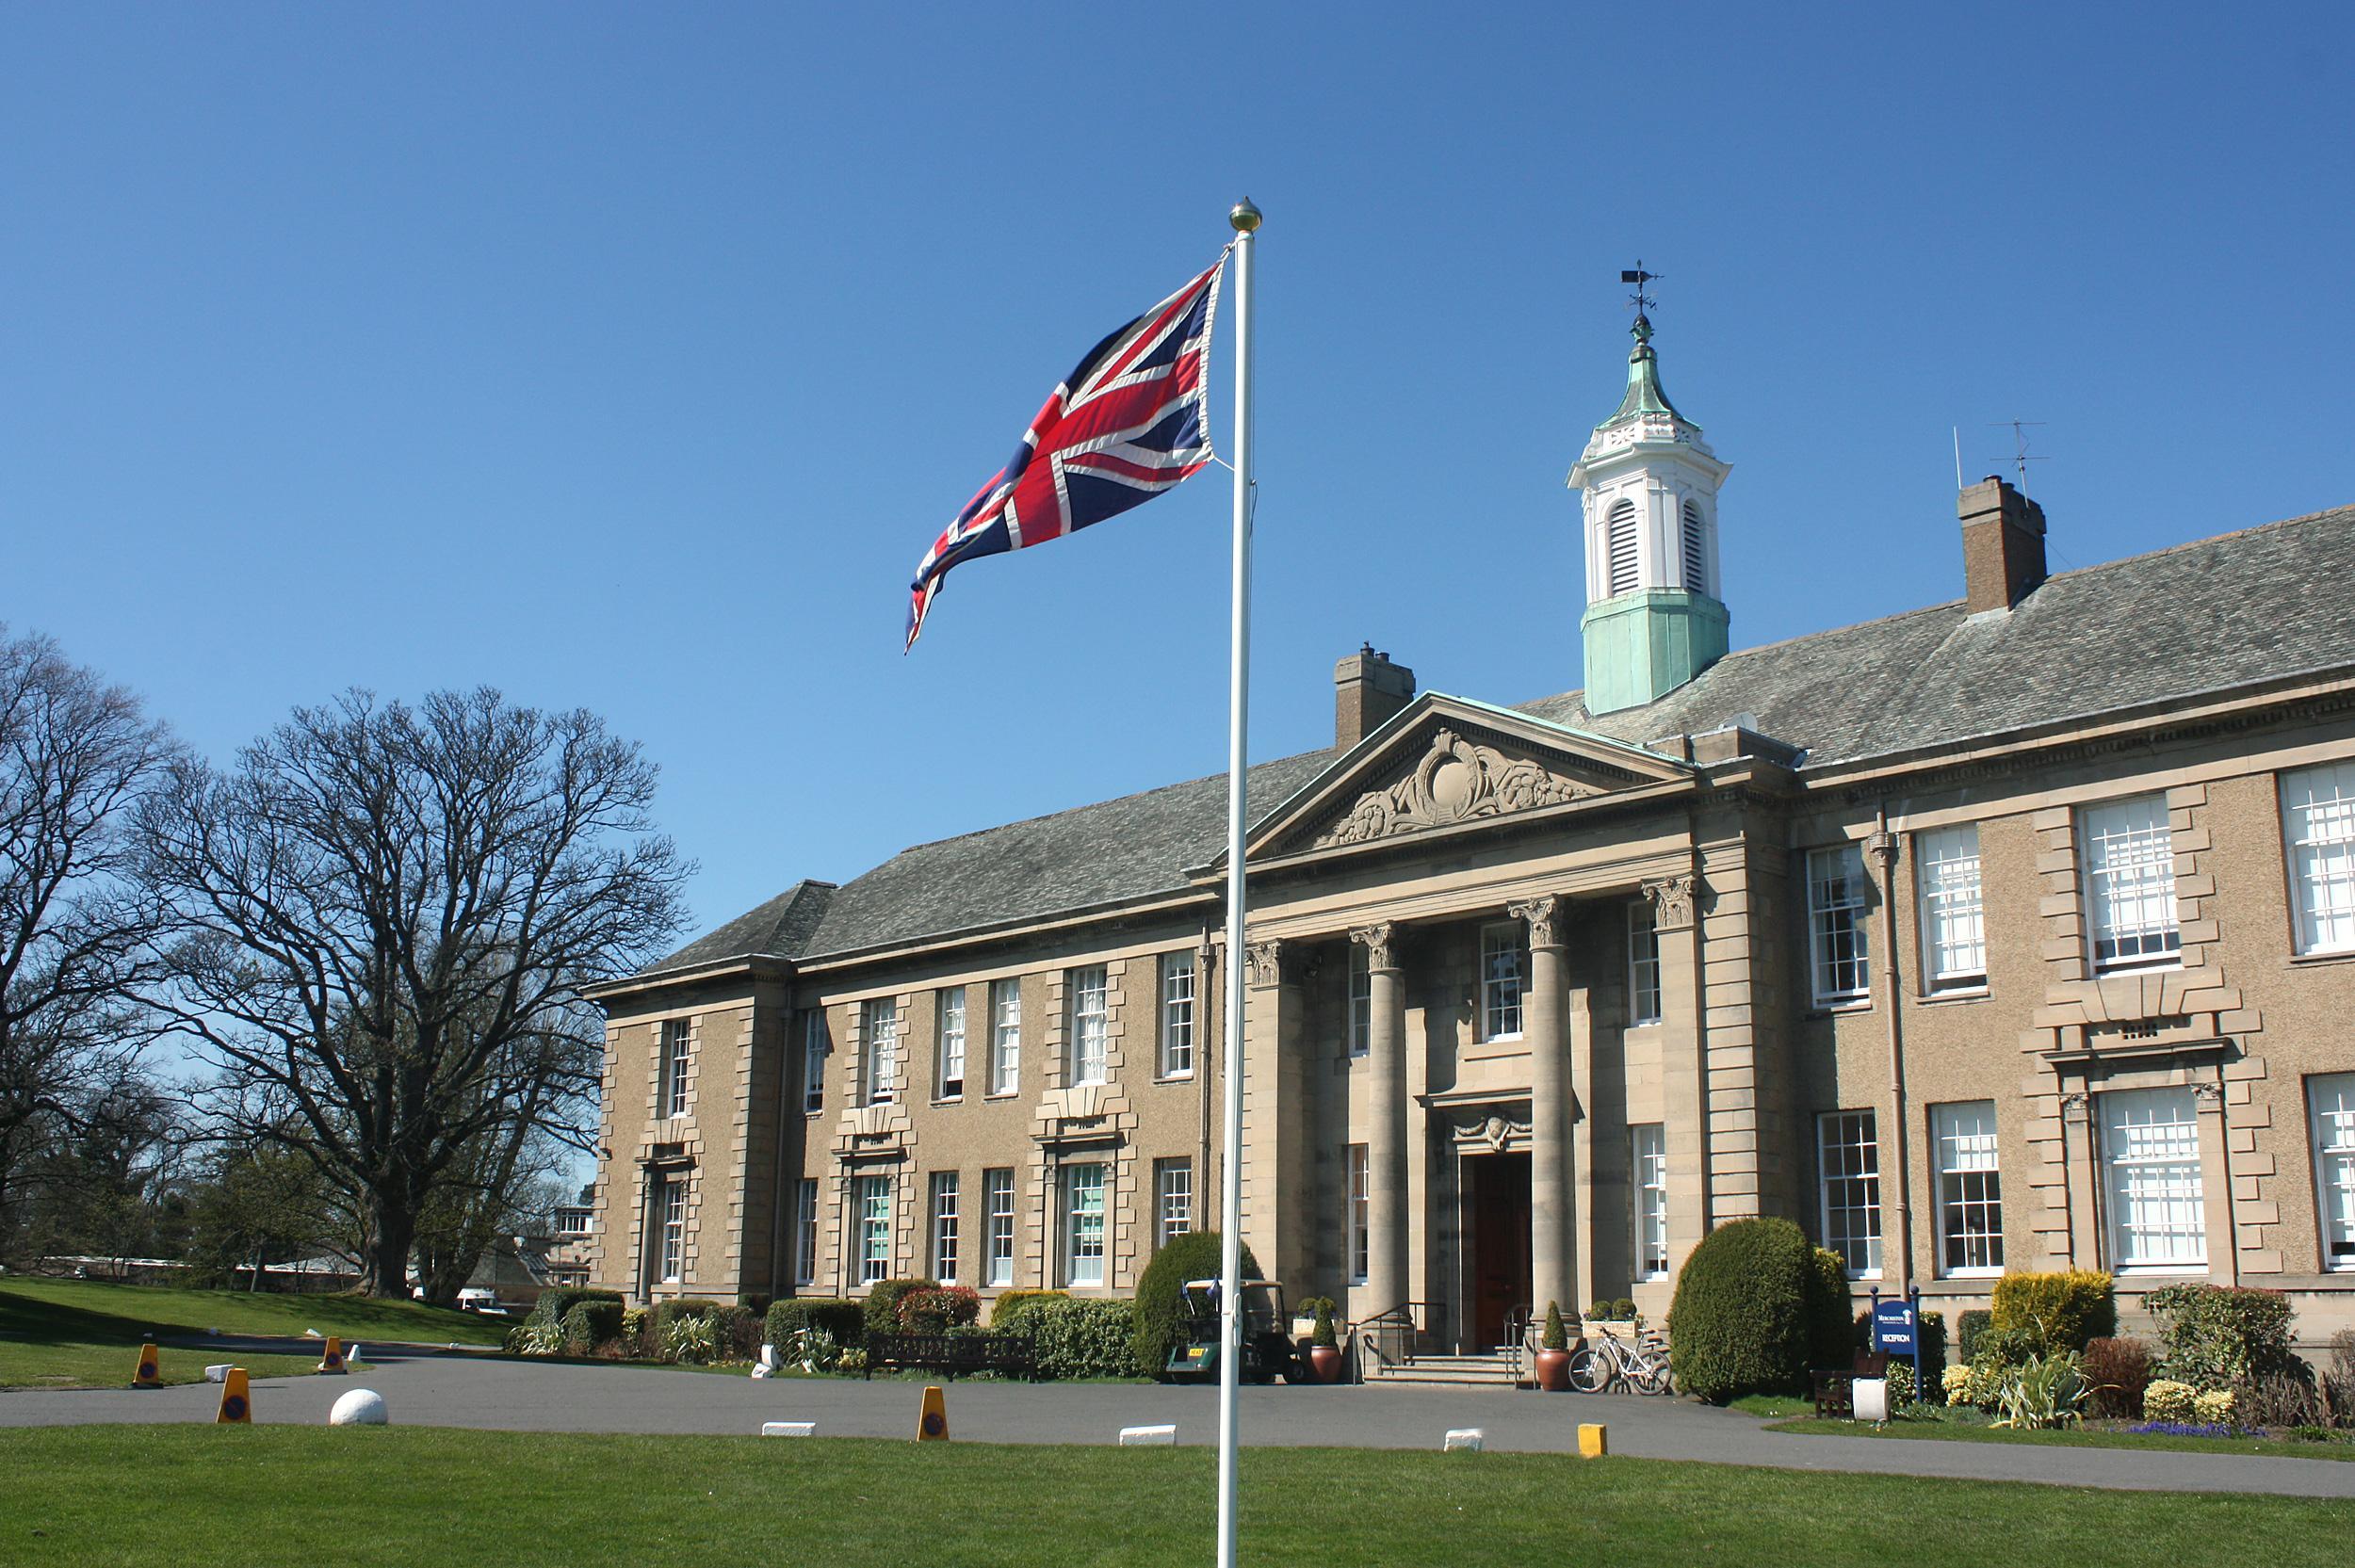 Merchiston Castle school for boys